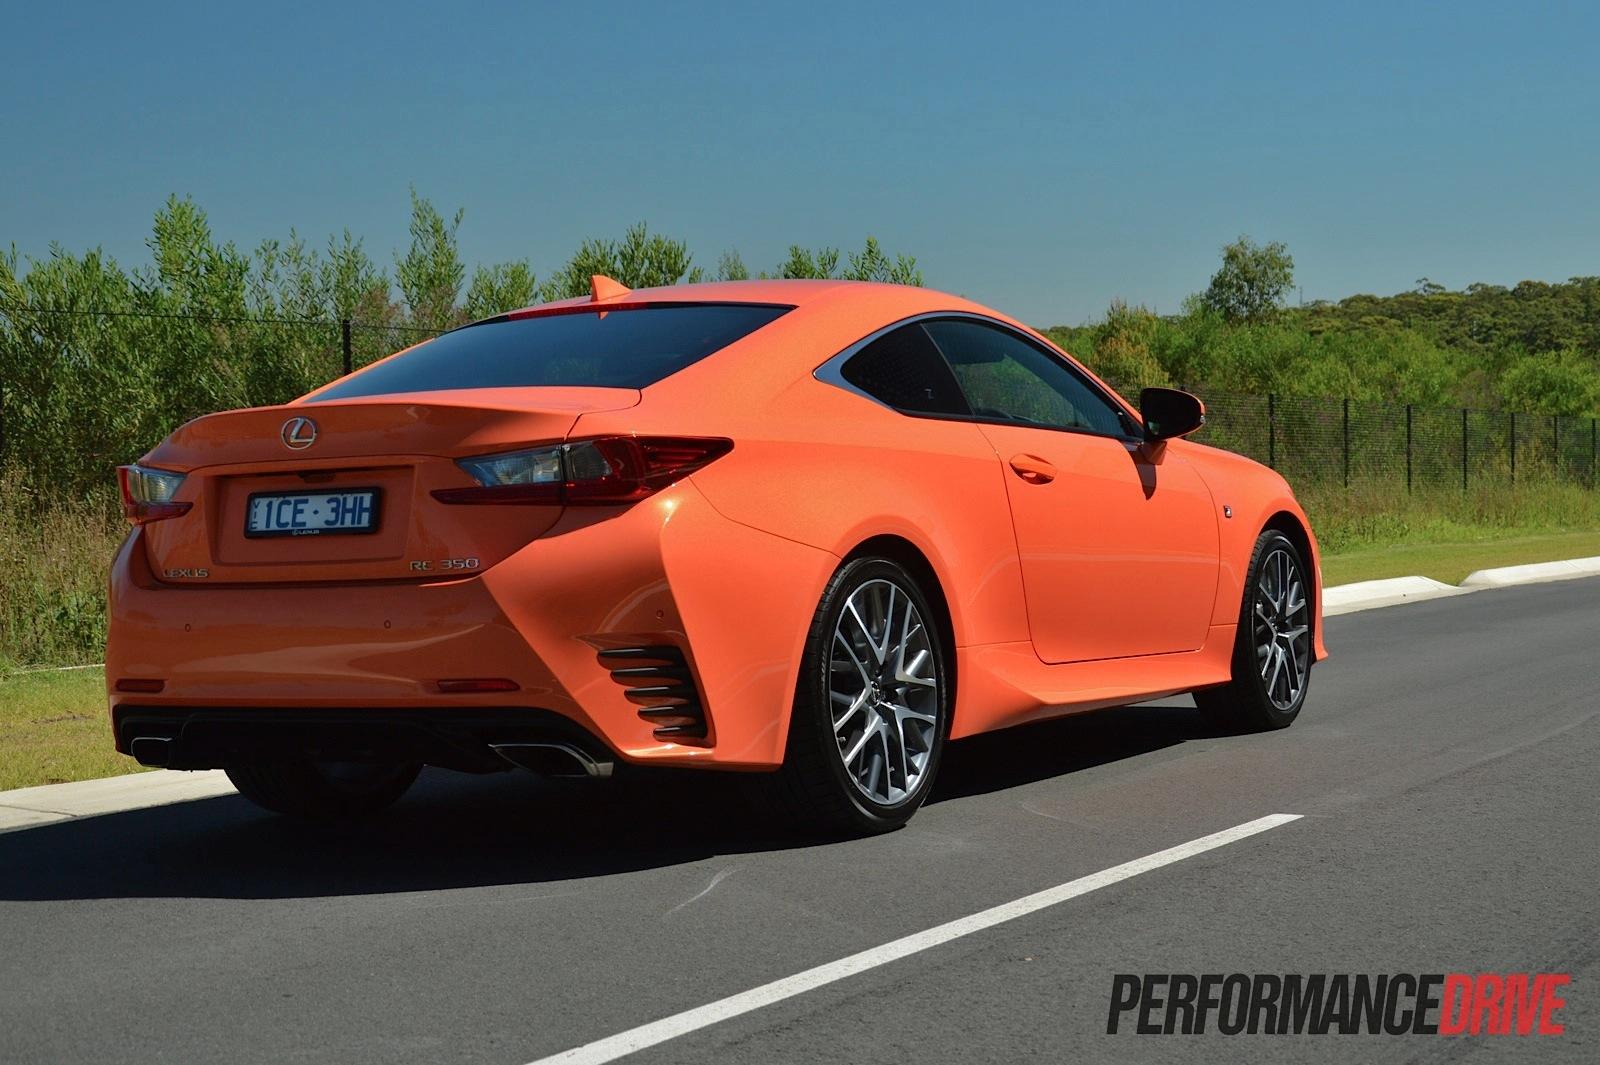 Lexus F Sport Price >> 2015 Lexus RC 350 F Sport review (video) | PerformanceDrive